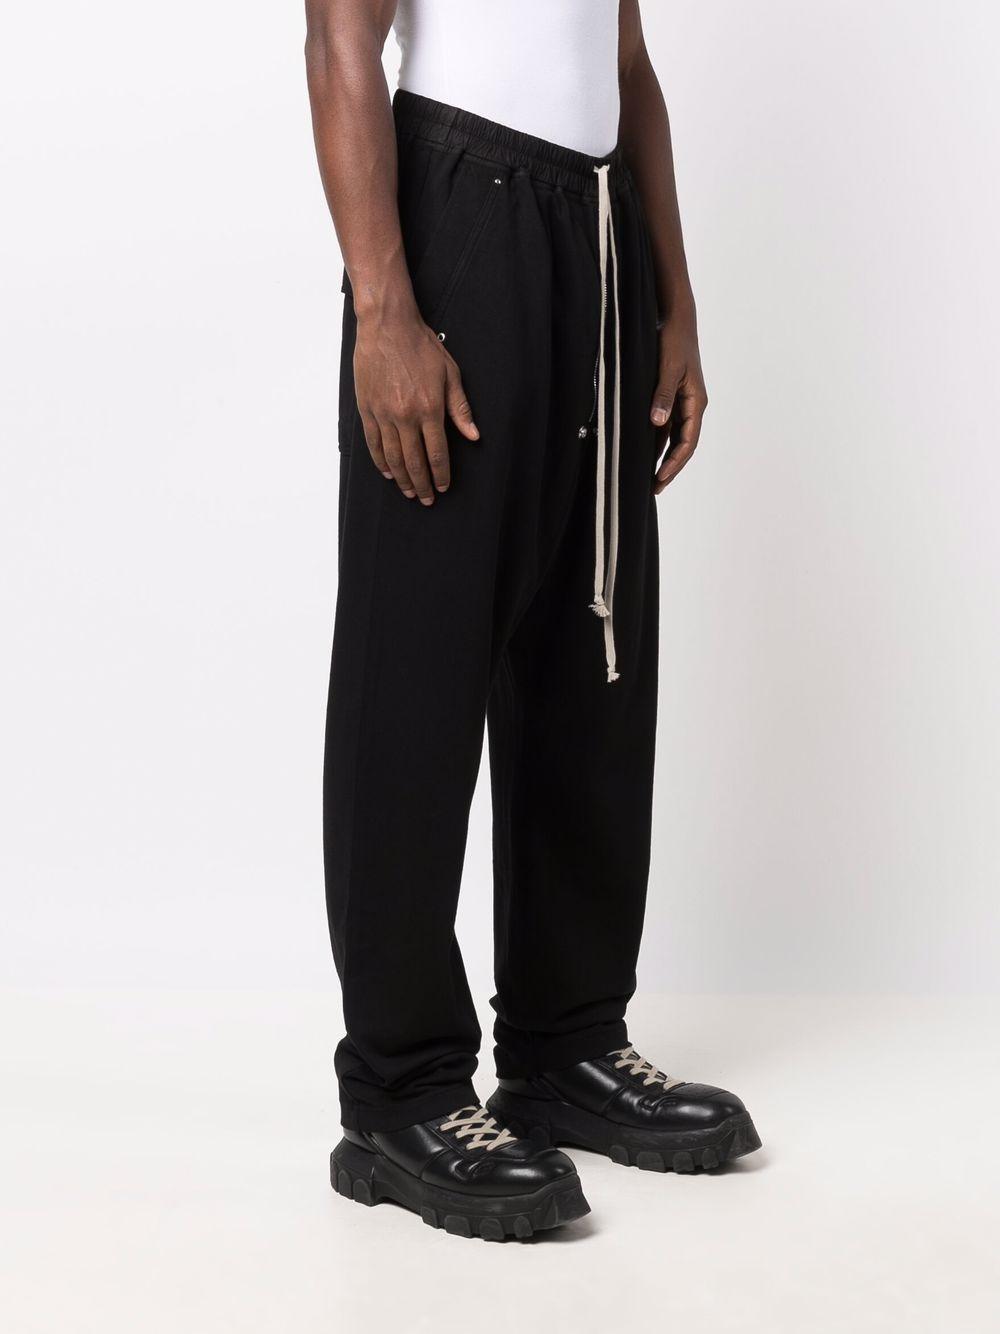 pantaloni bela uomo neri in cotone RICK OWENS DRKSHDW   Pantaloni   DU02A3377 RIG09